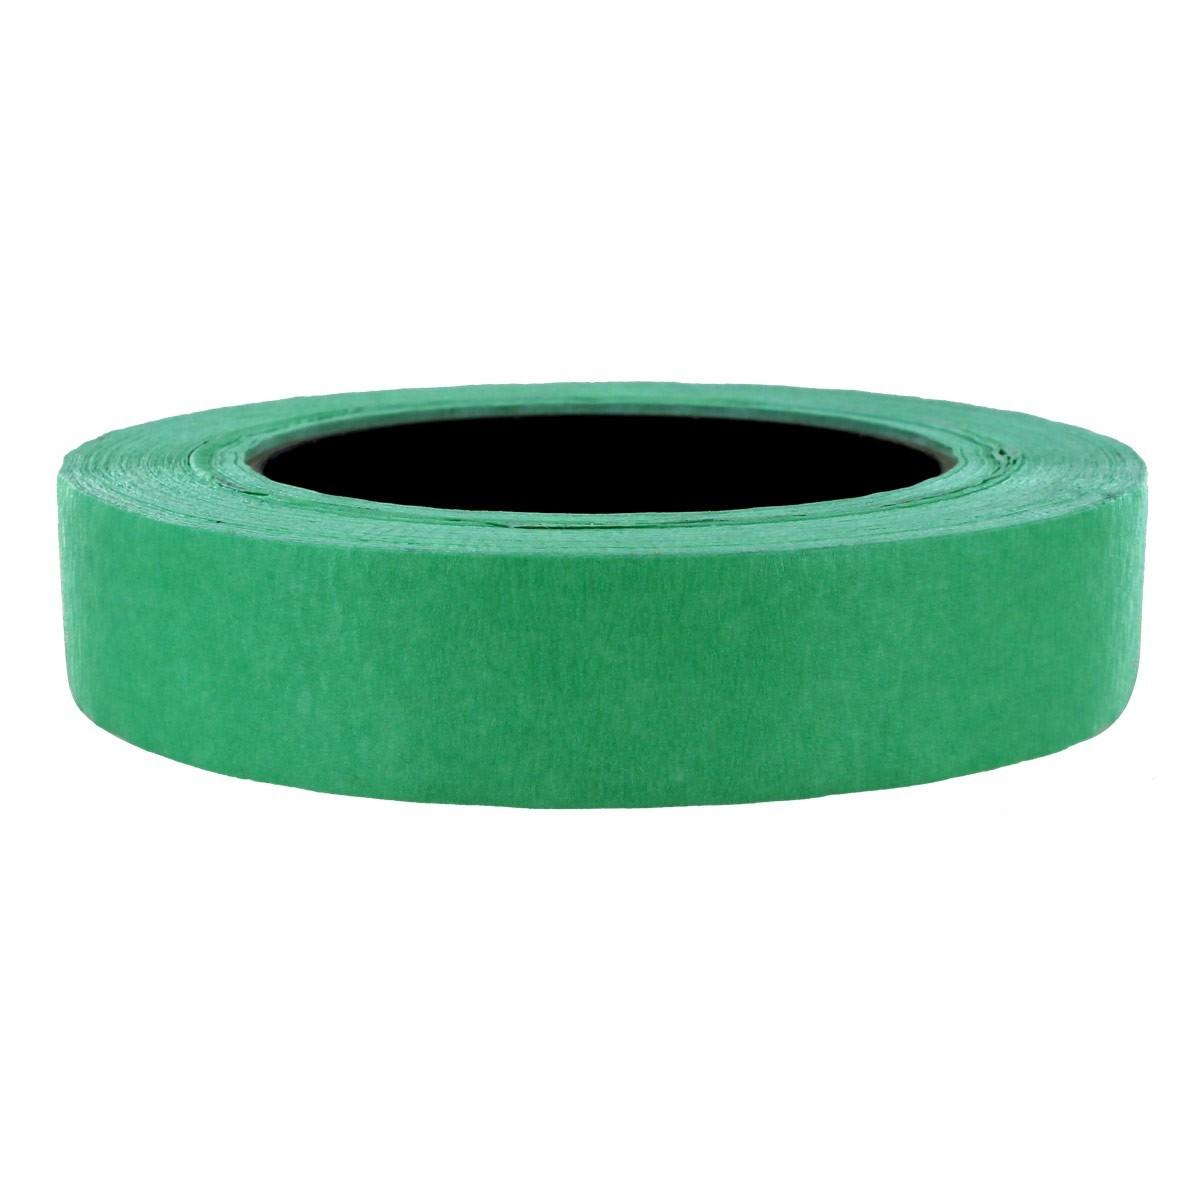 Masking Painters Tape, Green, 36 mm x 55 m, 3M 205, 32/cs